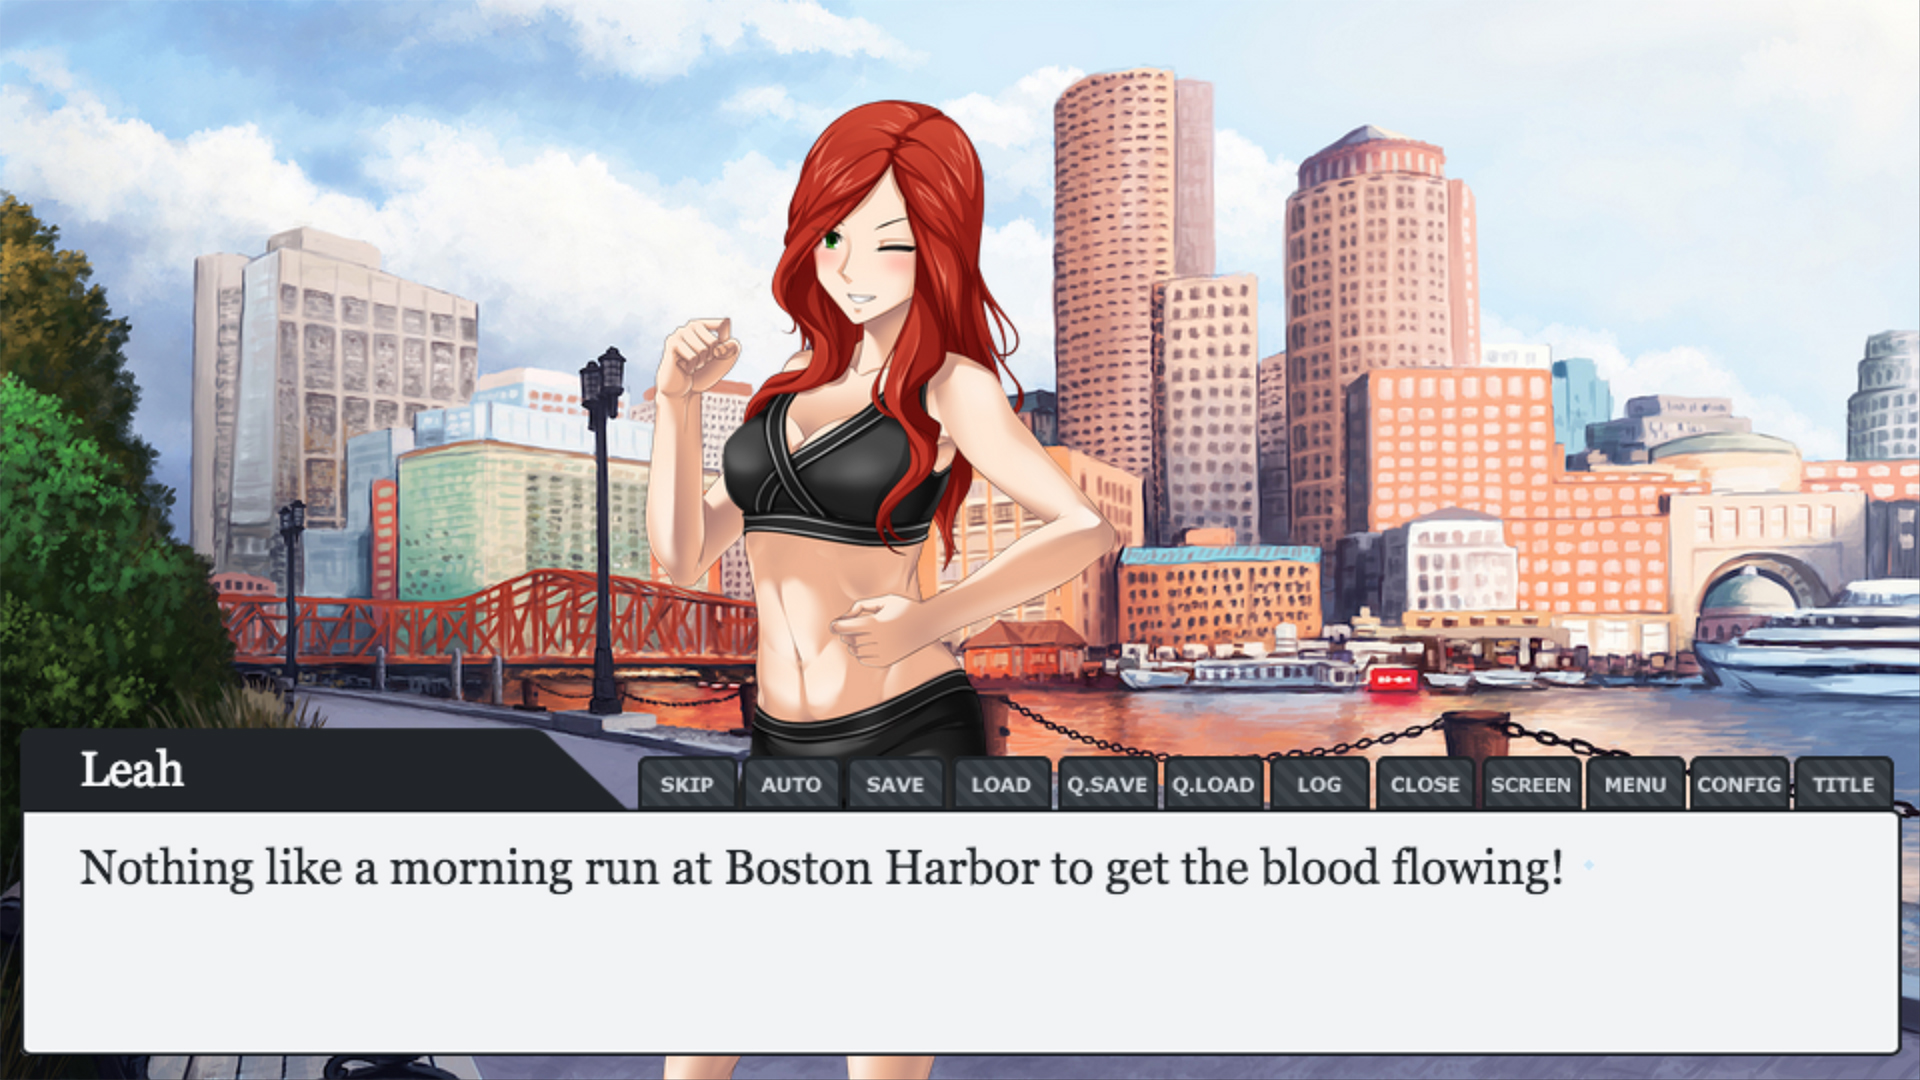 Boston ιστοσελίδες dating